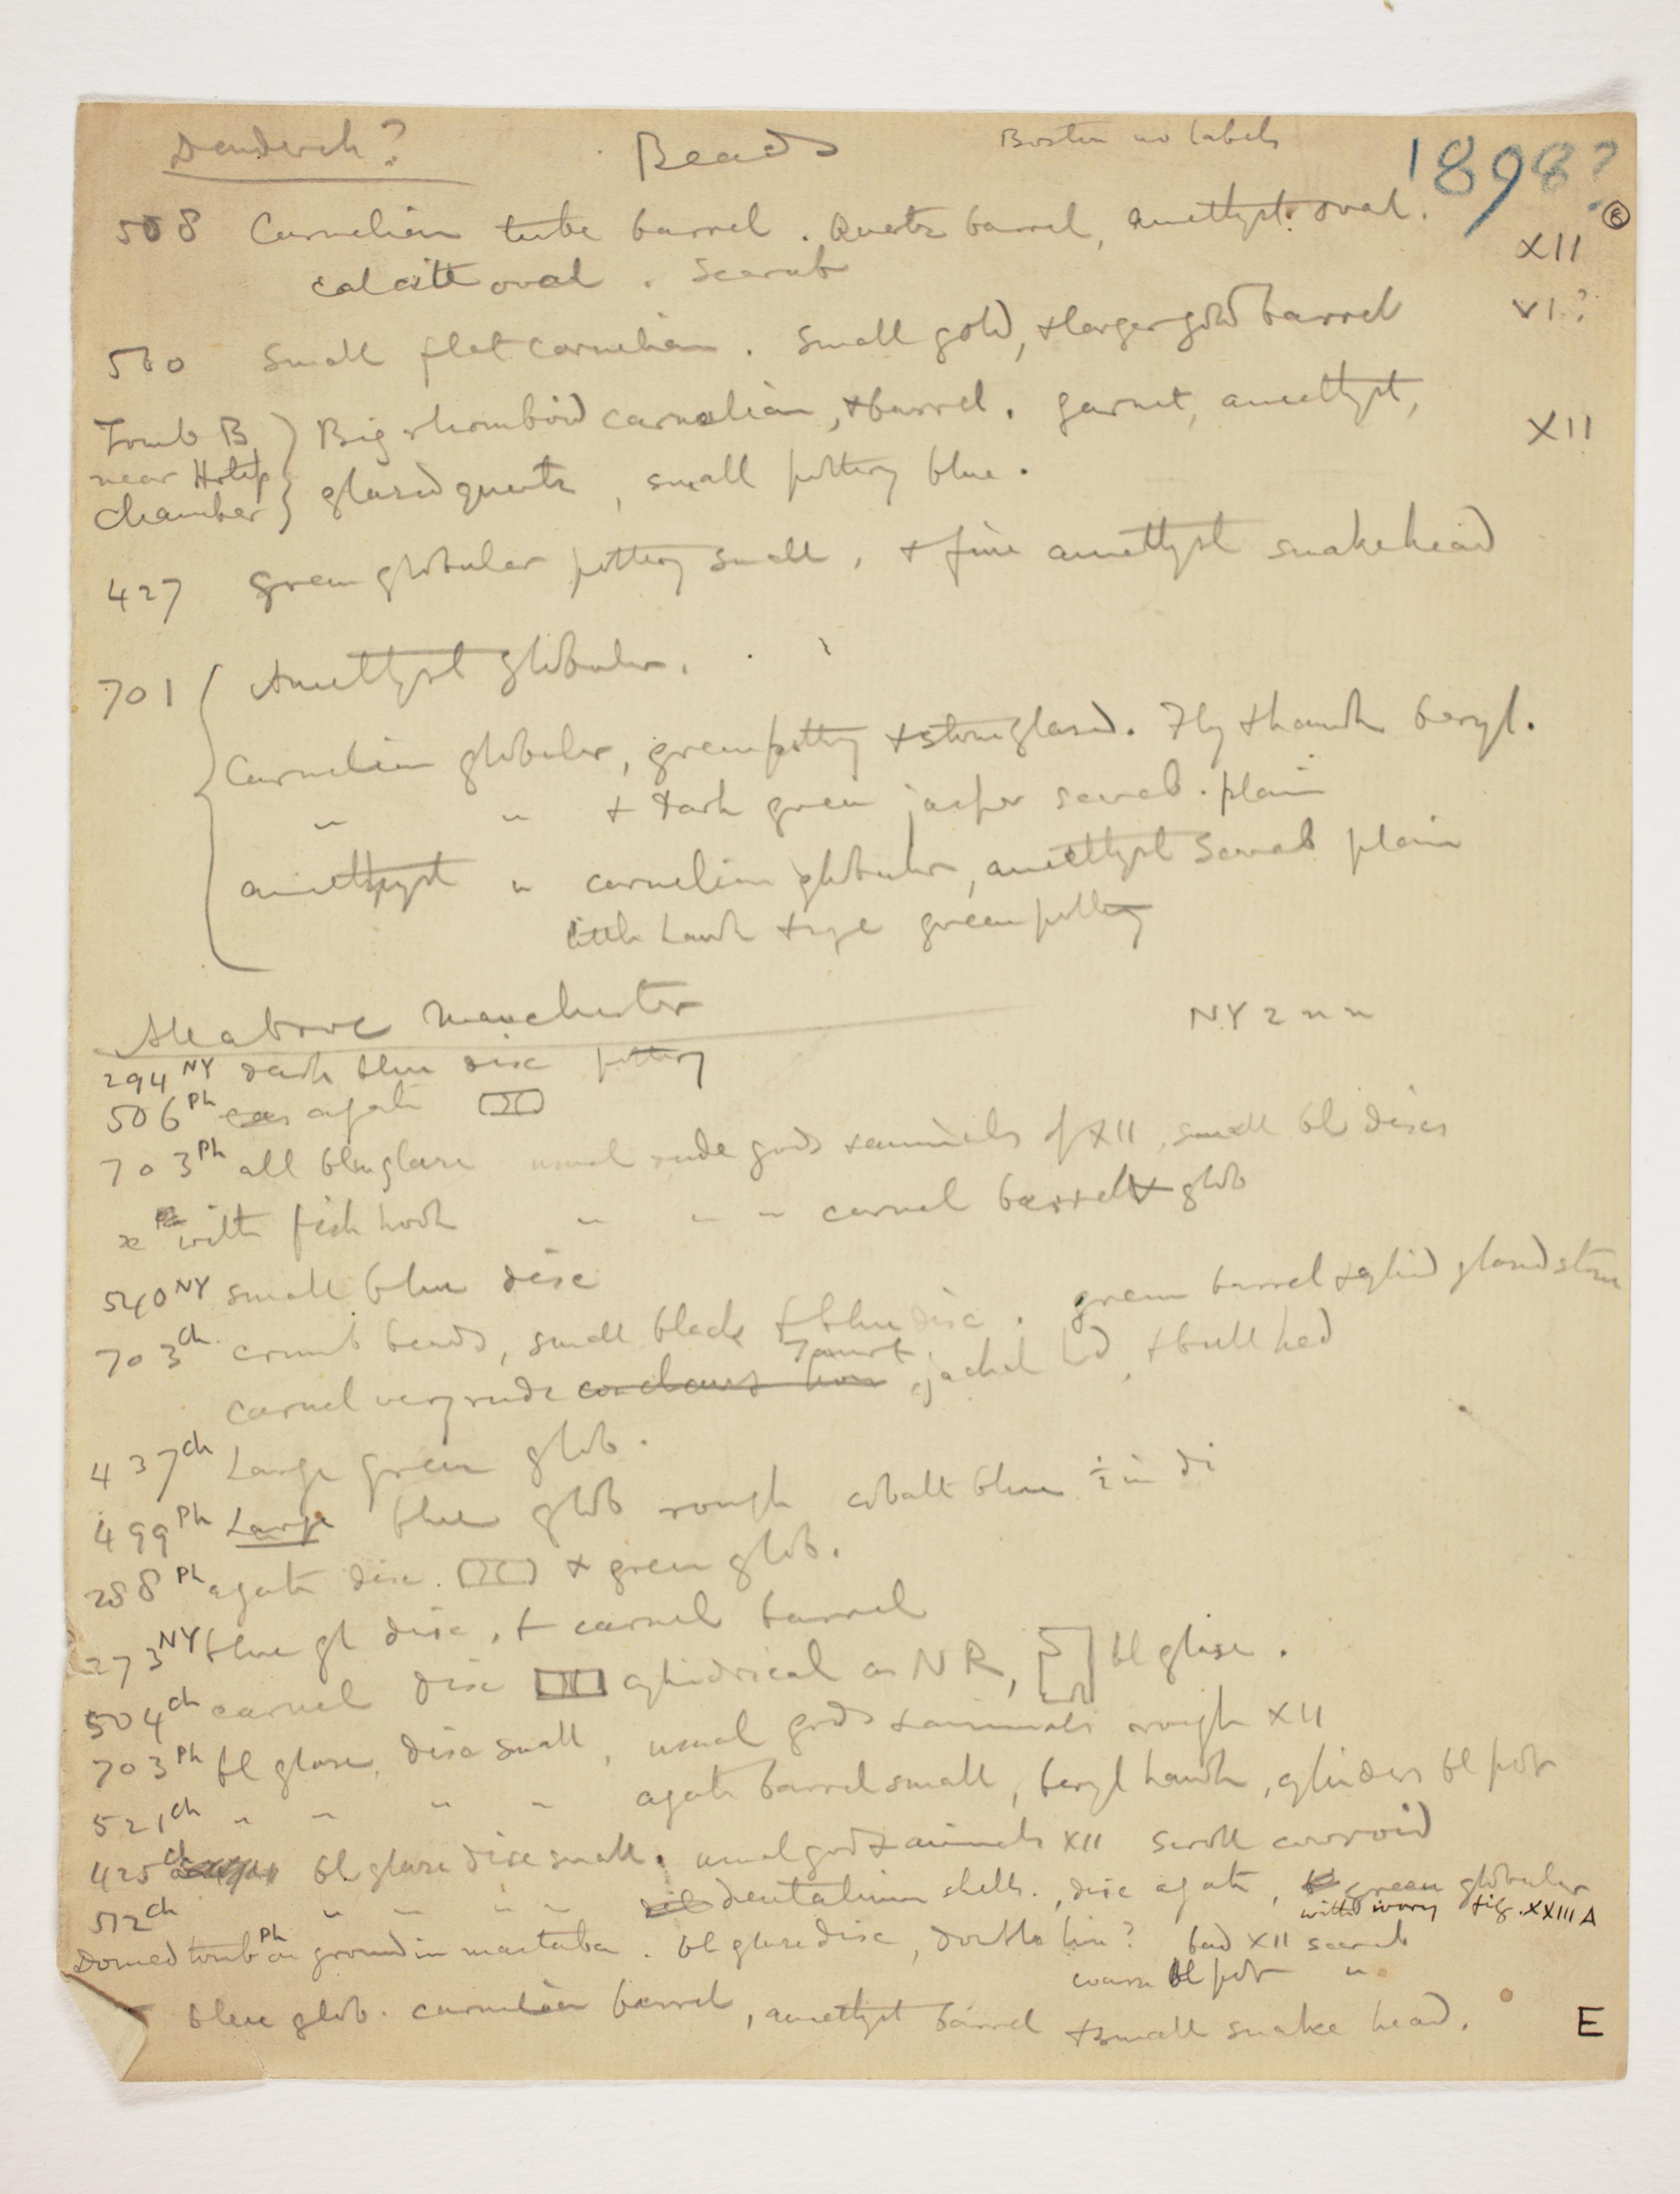 1897-98 Dendara, Hierakonpolis Multiple institution list PMA/WFP1/D/6/8